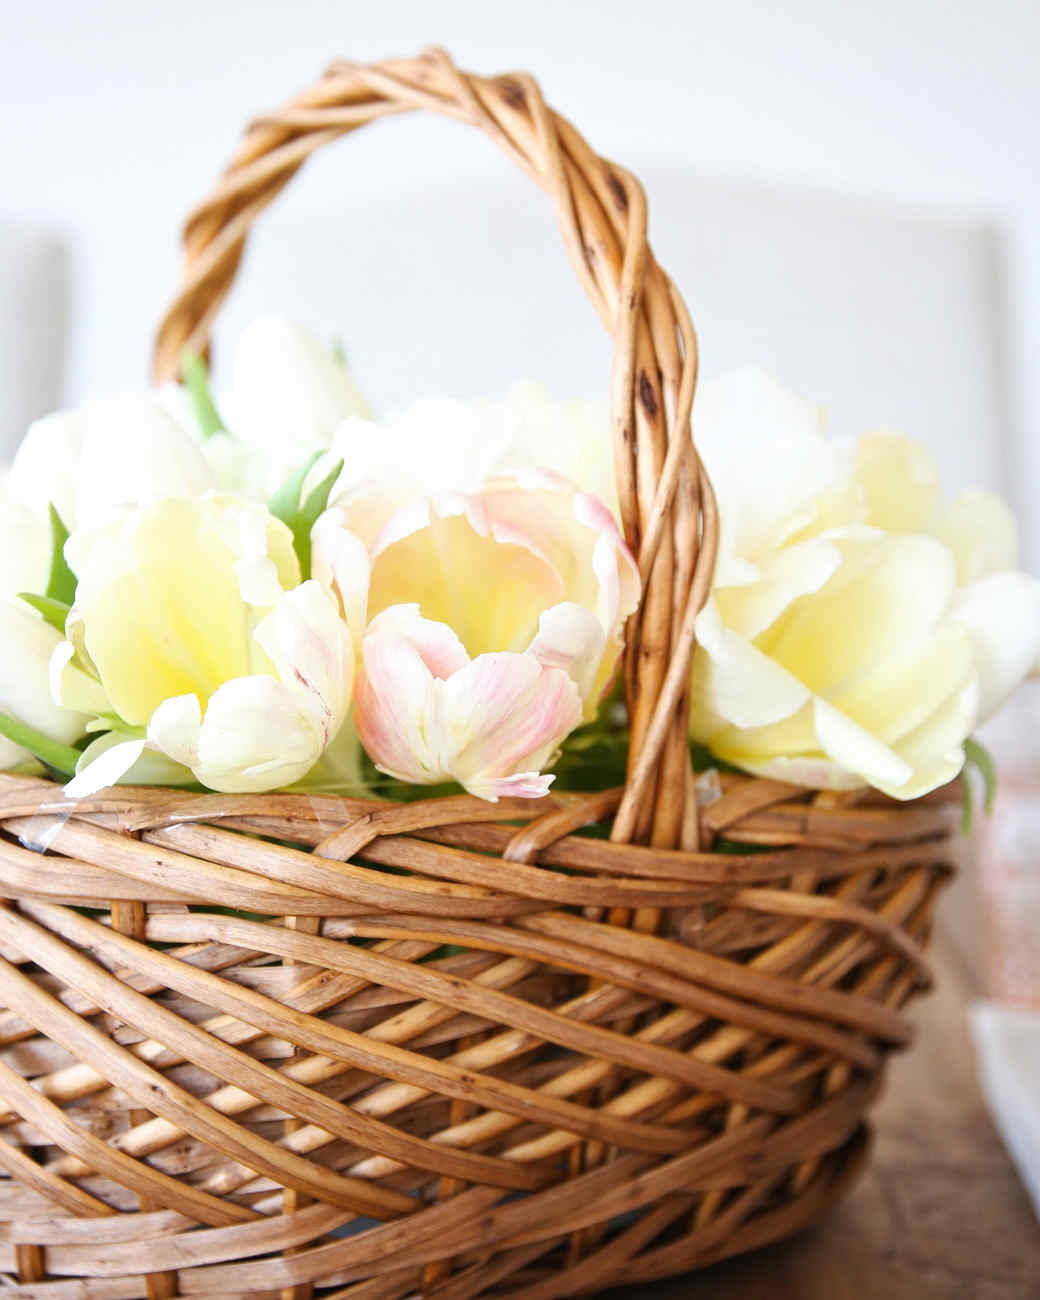 basket-of-tulips.jpg